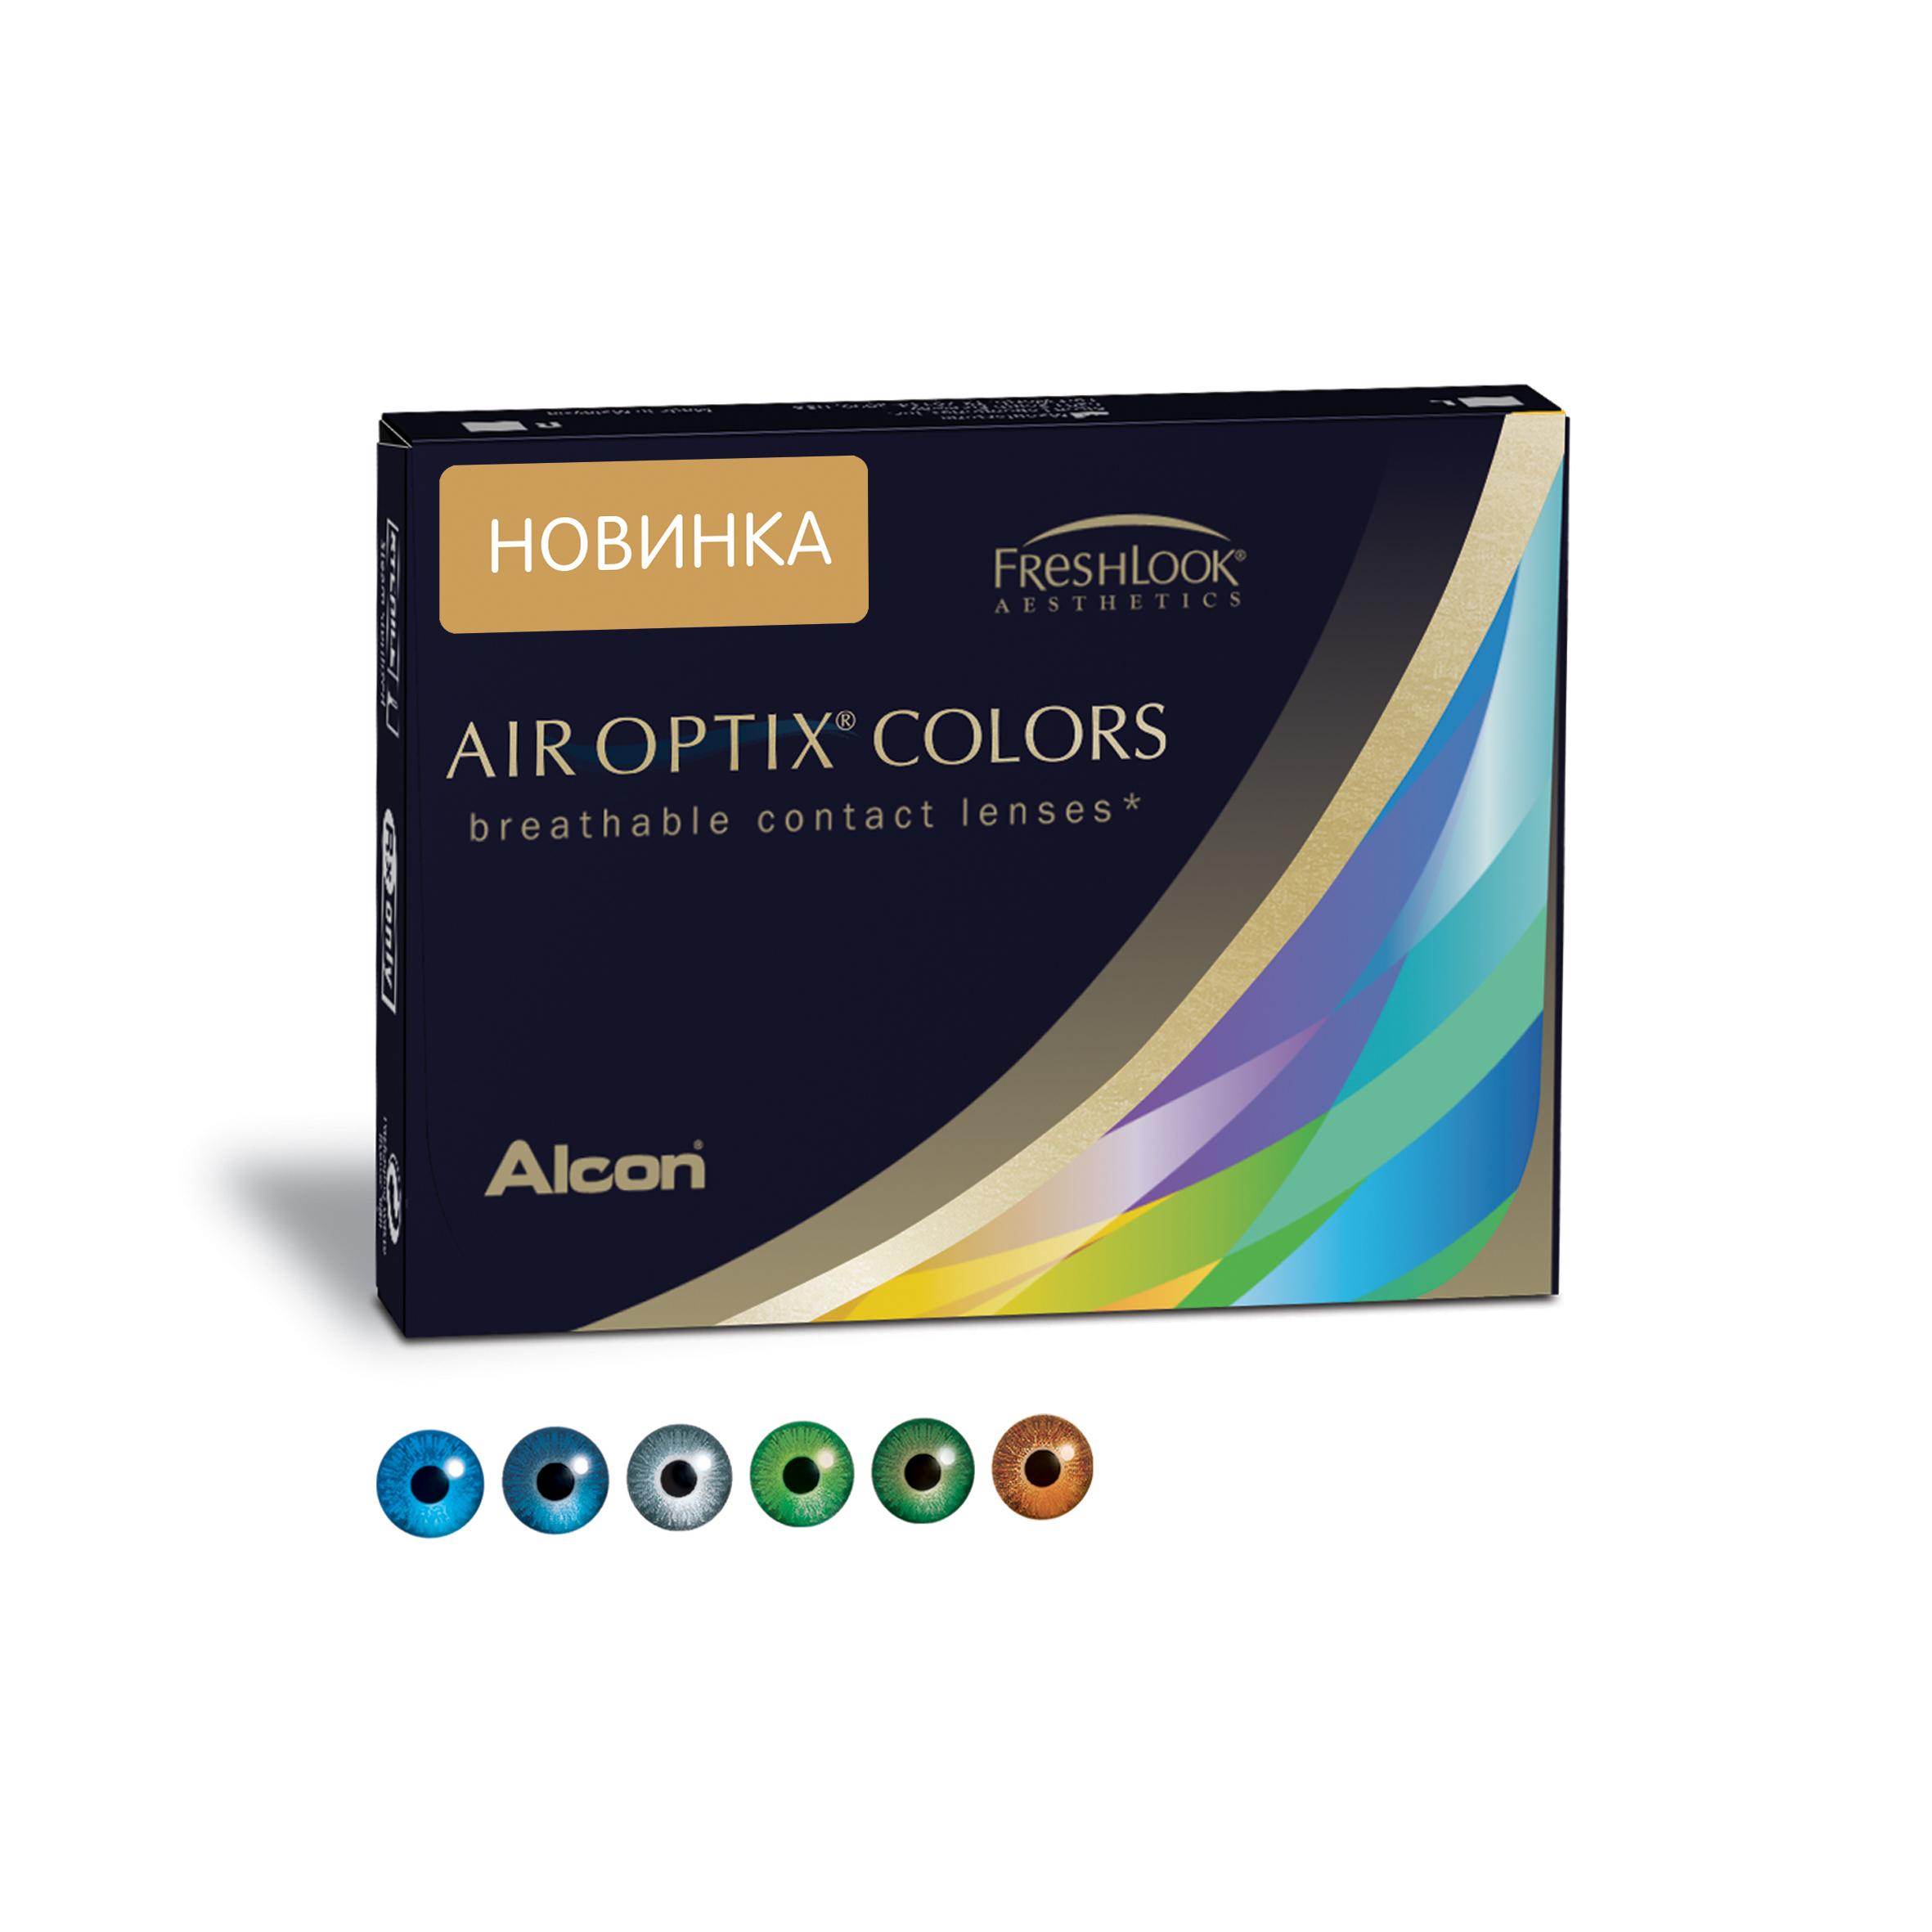 Аlcon контактные линзы Air Optix Colors 2 шт -3.50 Blue31746211Мягкие контактные линзы